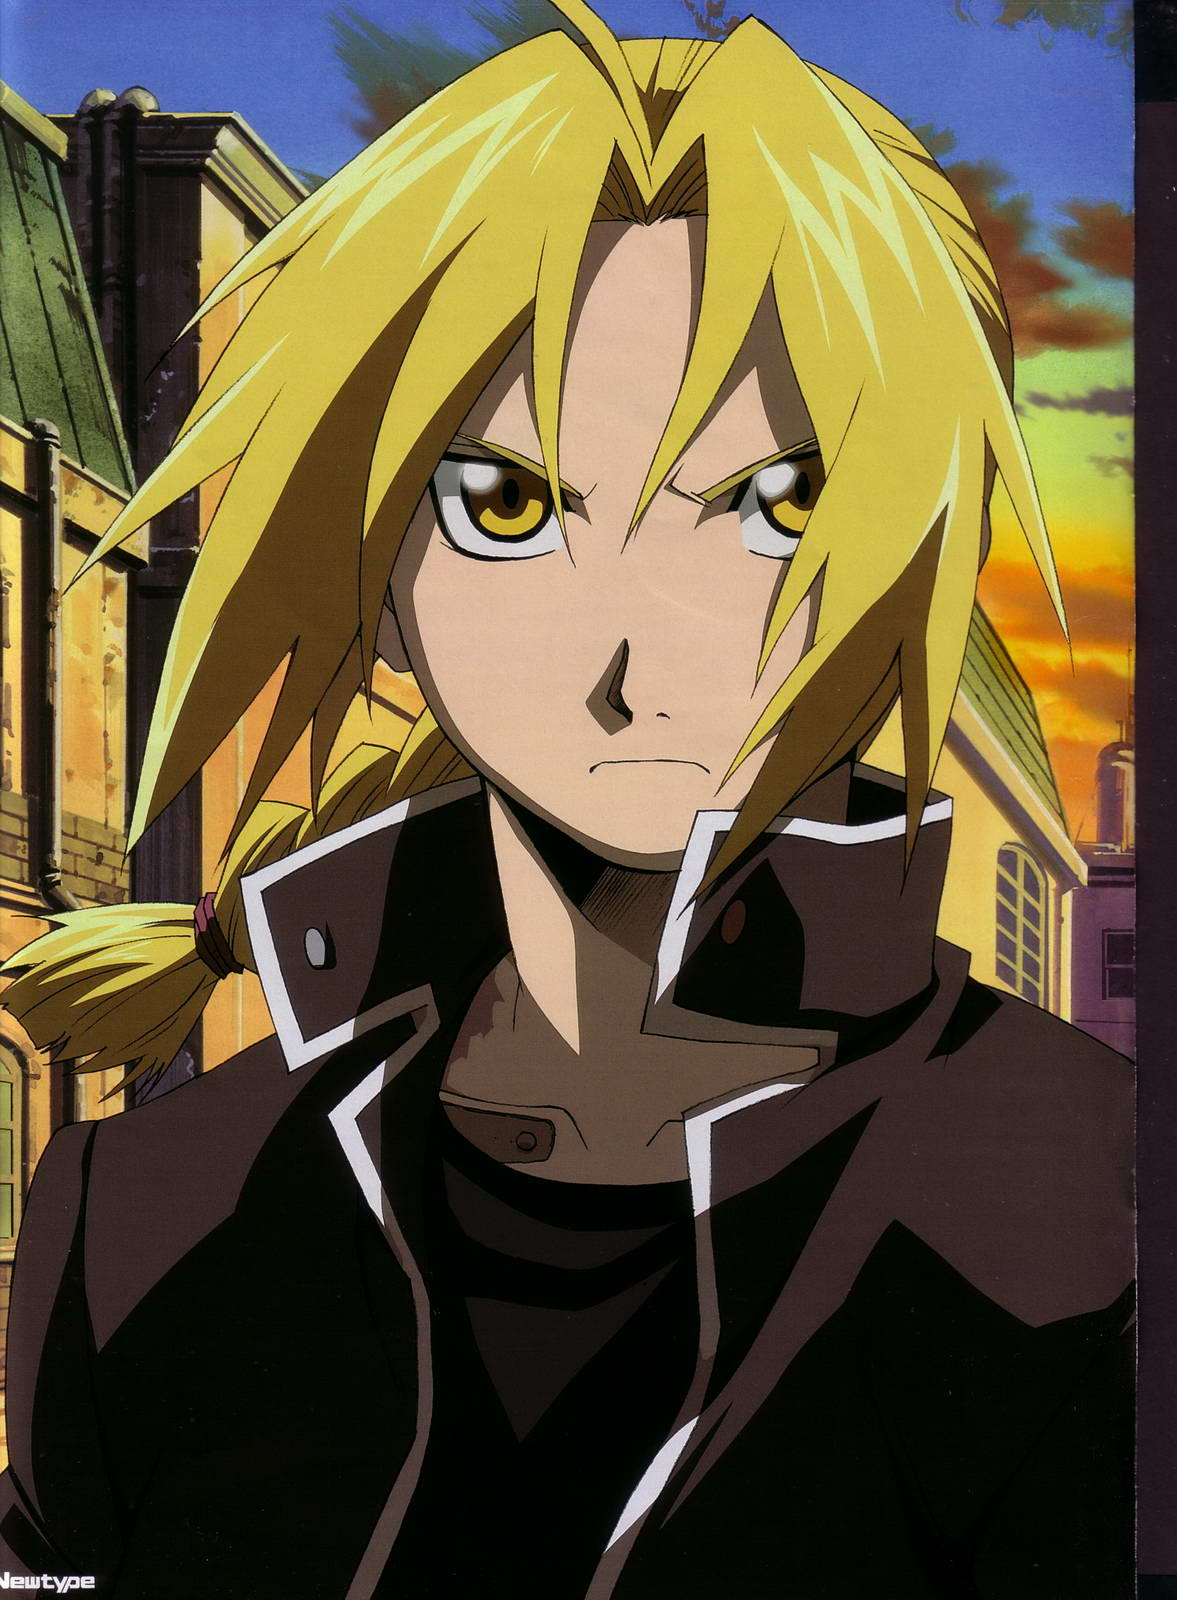 Edward Elric - Fullmetal Alchemist - Image #963140 ...